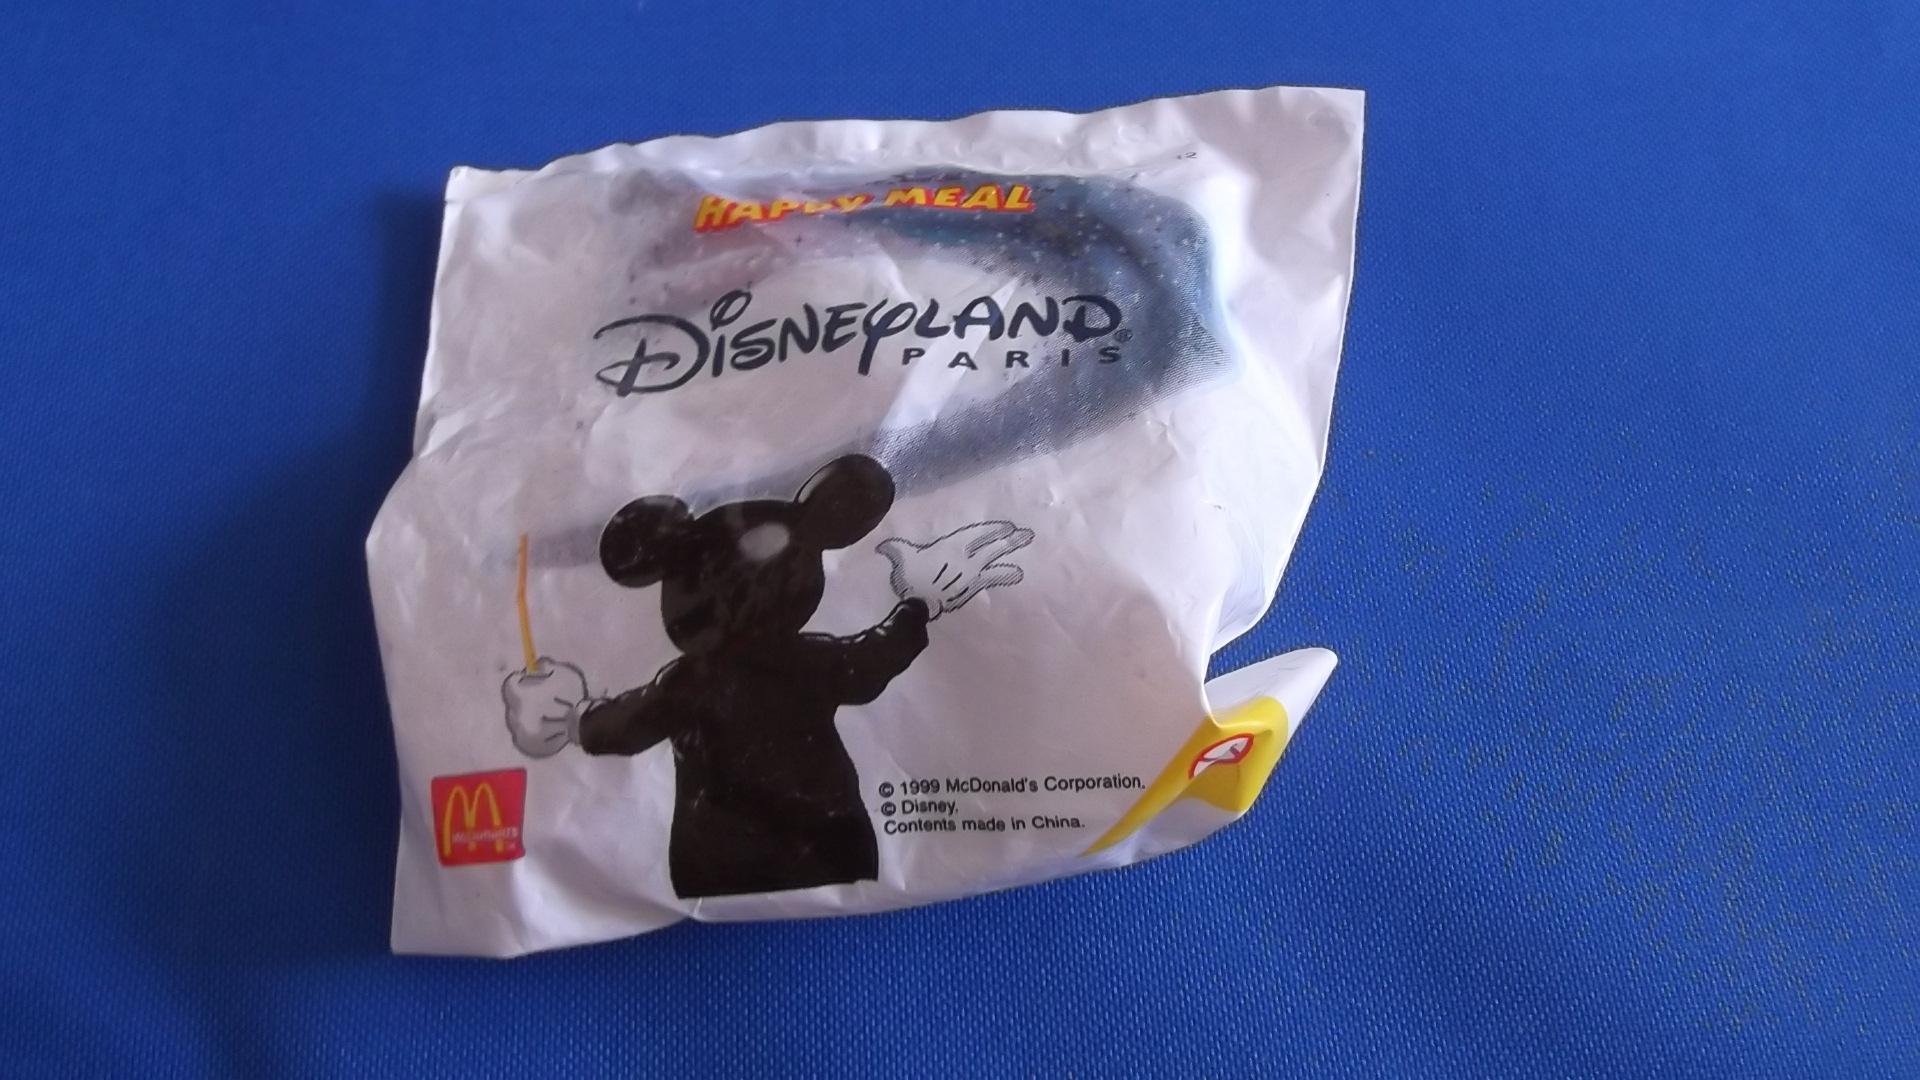 McDonalds Disneyland Paris Train #12 Toy From 1999 New